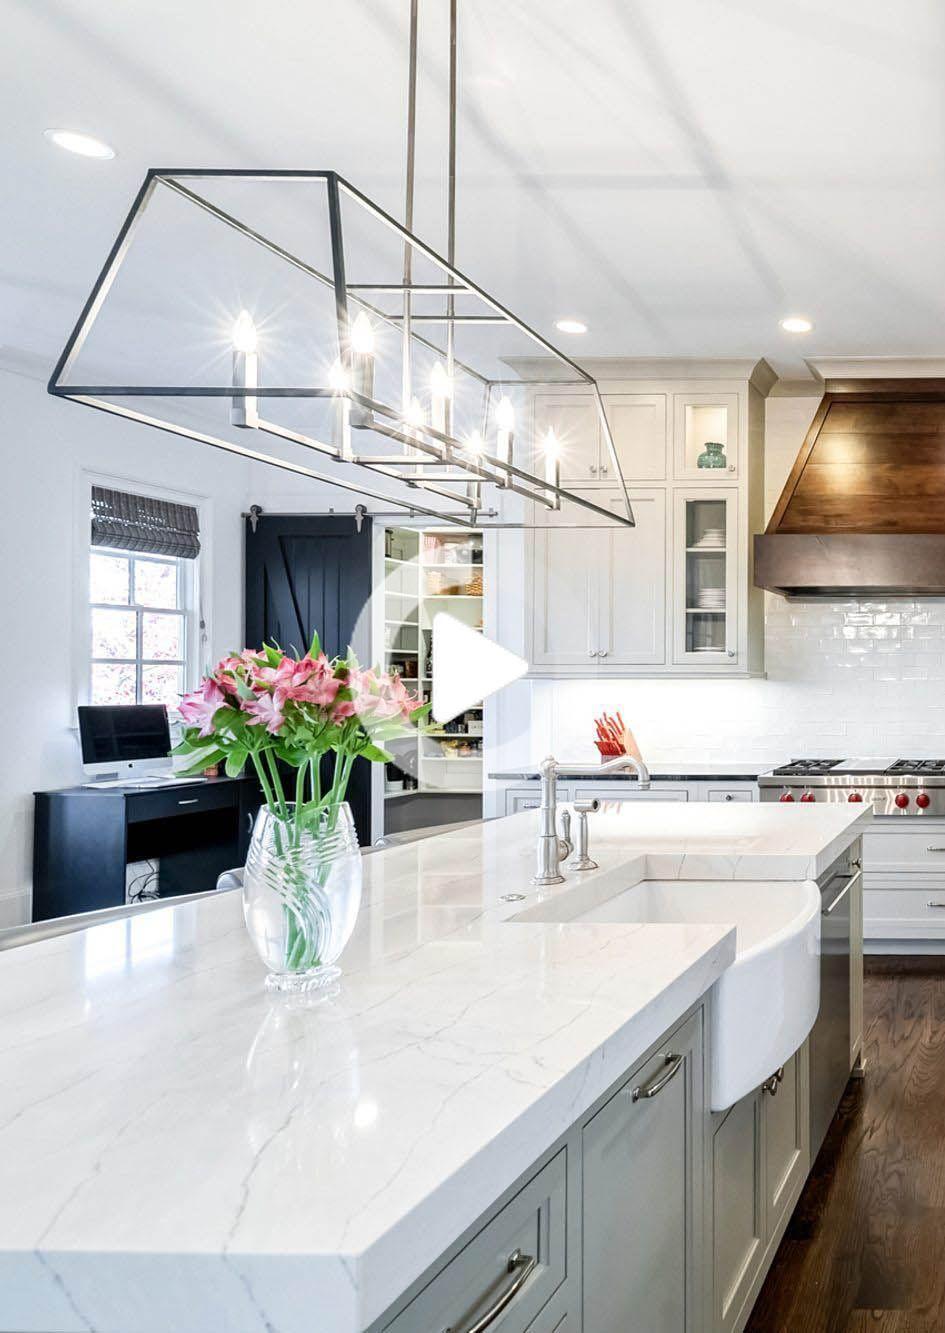 Quartz Vs Granit En 2020 Salle A Manger Cuisine Comptoir Cuisine Idee Salle De Bain